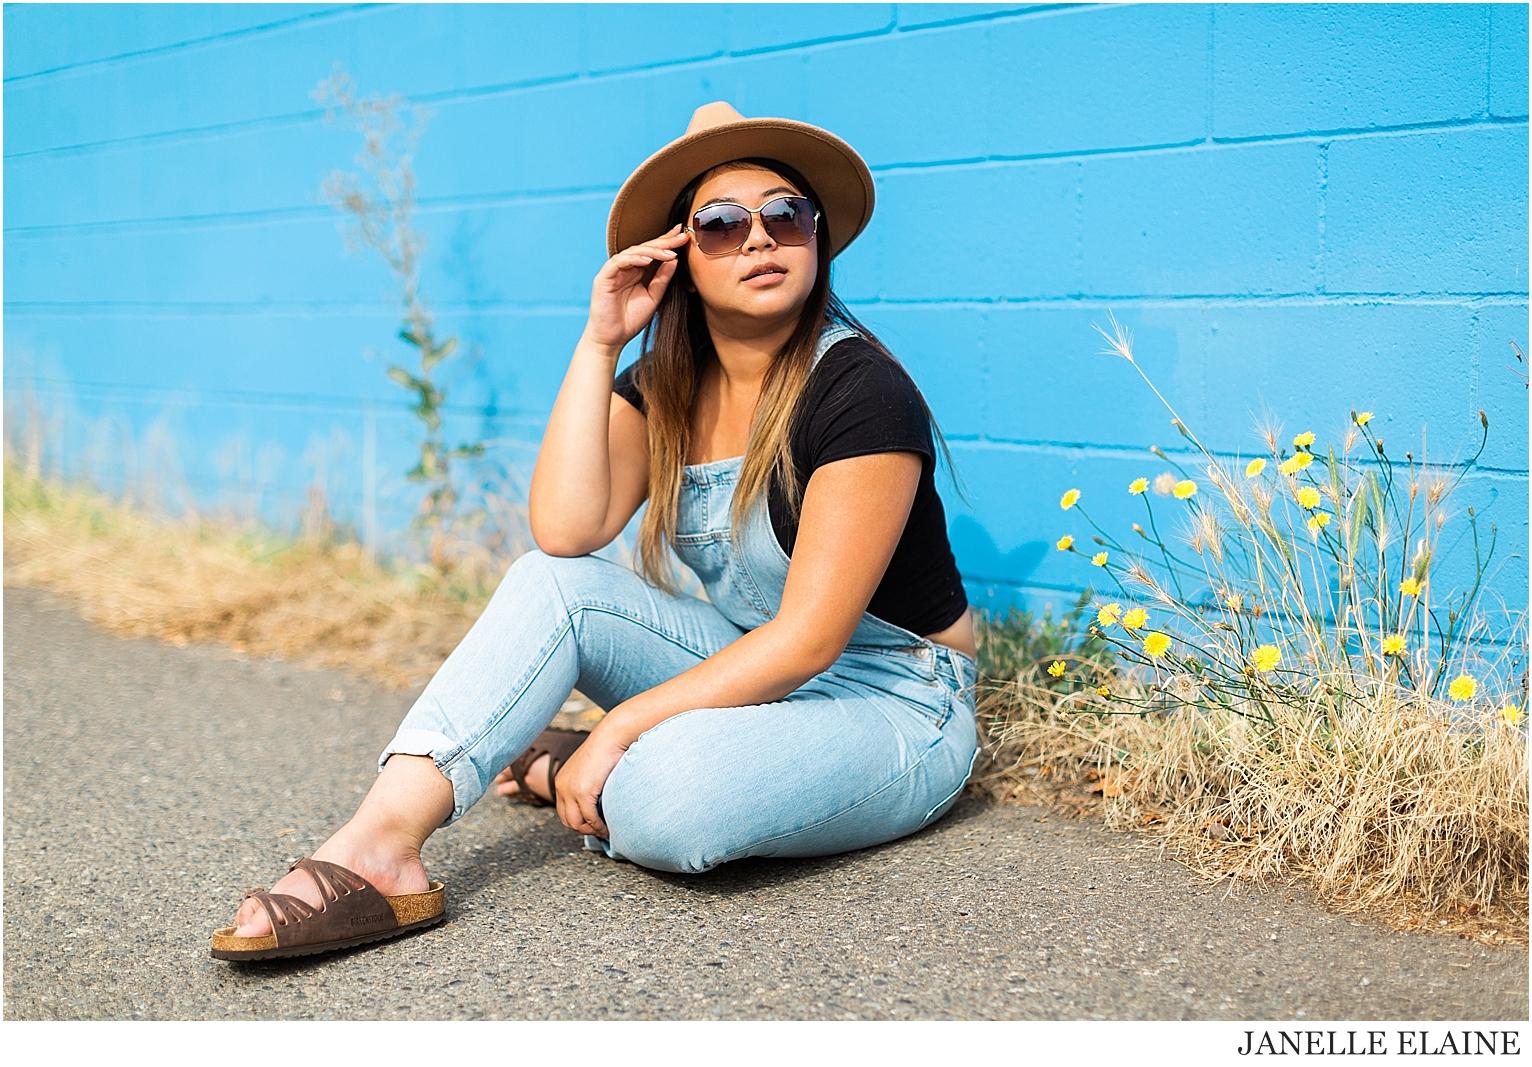 Aiko-Seattle WA-lifestyle photoshoot-Renton-Janelle Elaine Photography-8.jpg